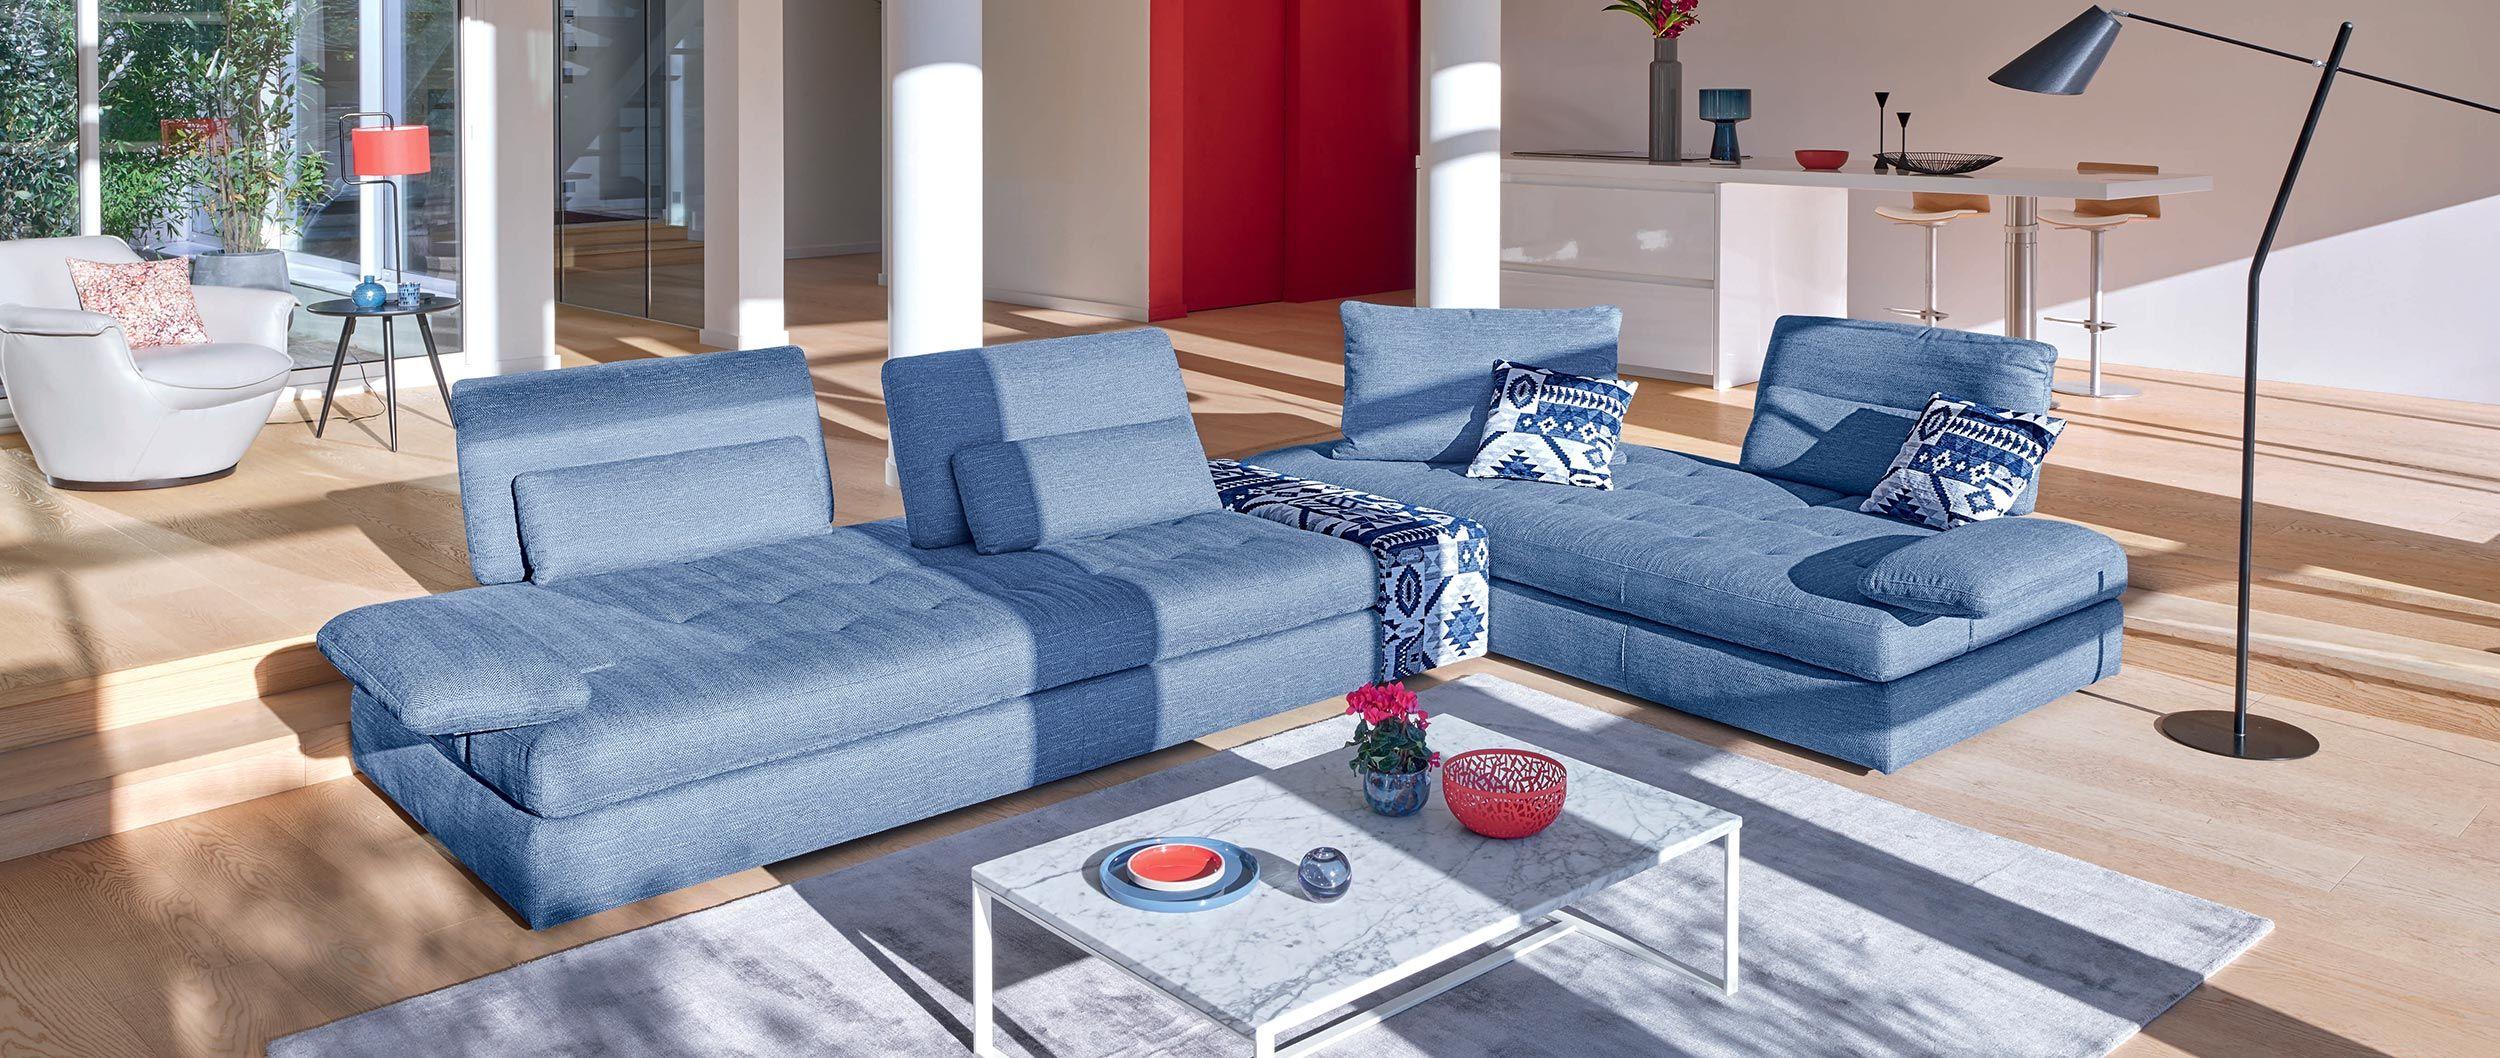 Panorama Cuir Center Deco Pinterest Canape Angle Tissu  # Meuble Tv Cuir Center